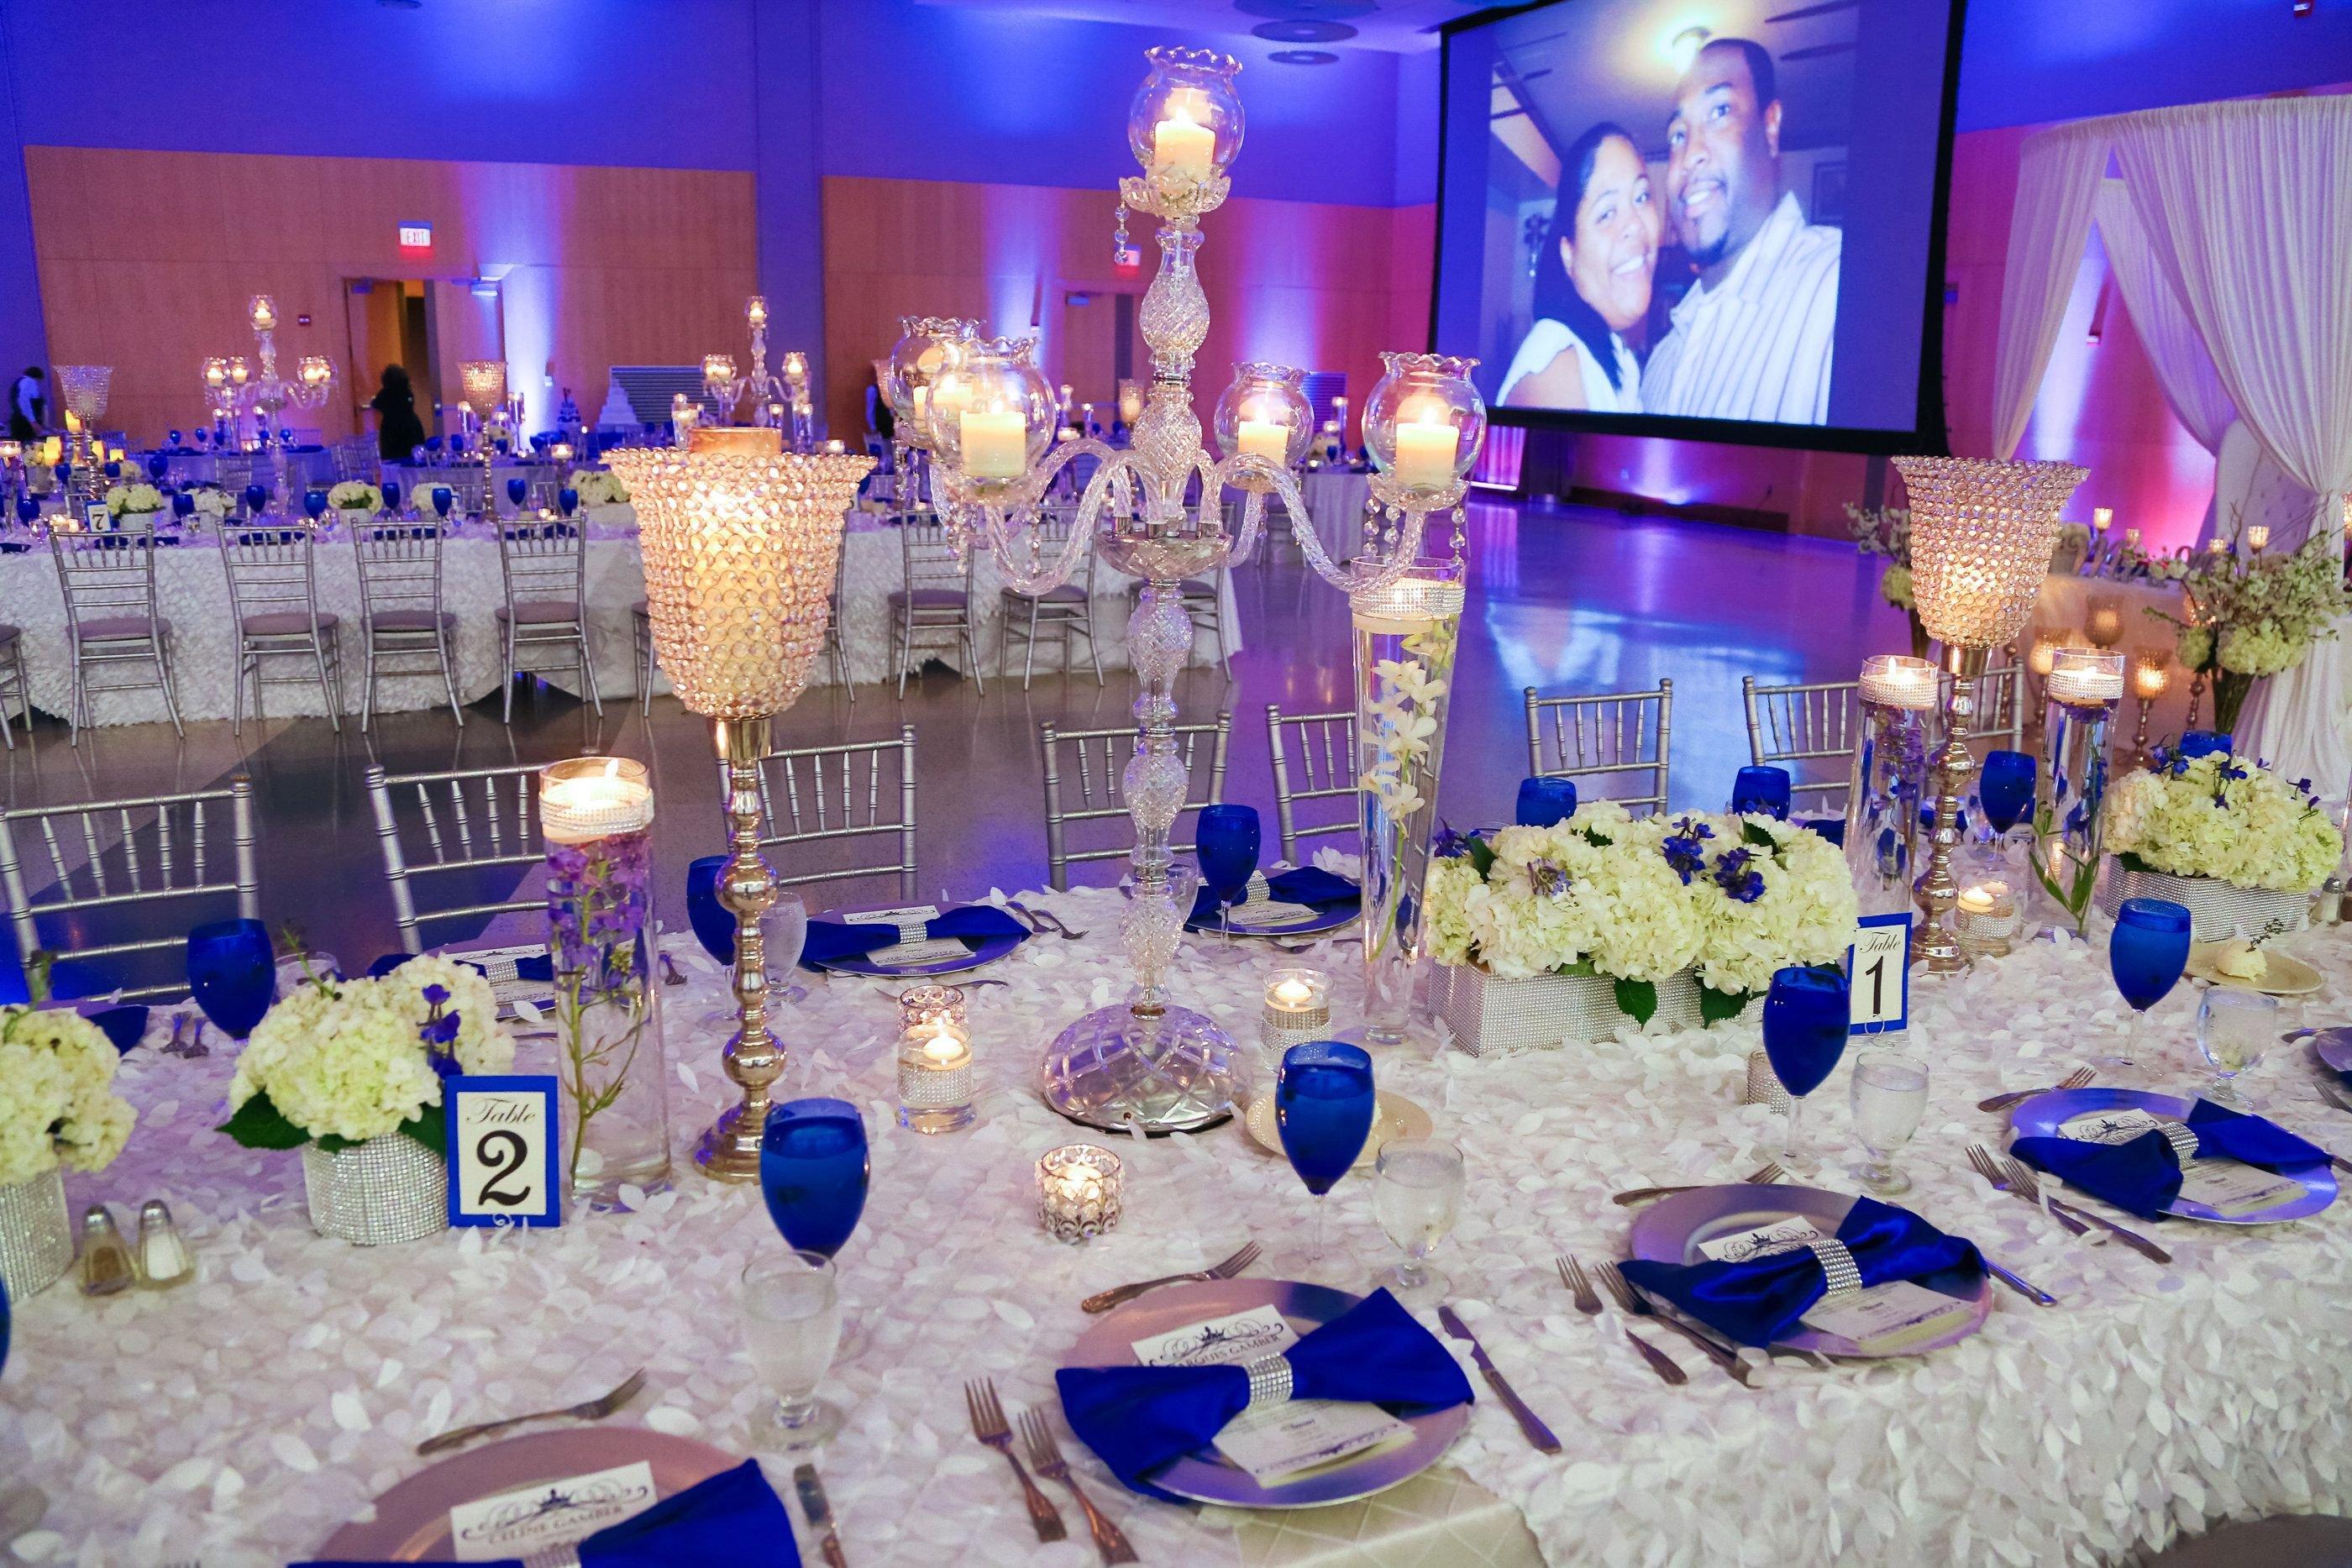 Royal Blue Decor for Weddings Awesome Our Royal Blue and White Wedding Bridal Party Blue Wedding Reception Decor Candelabras